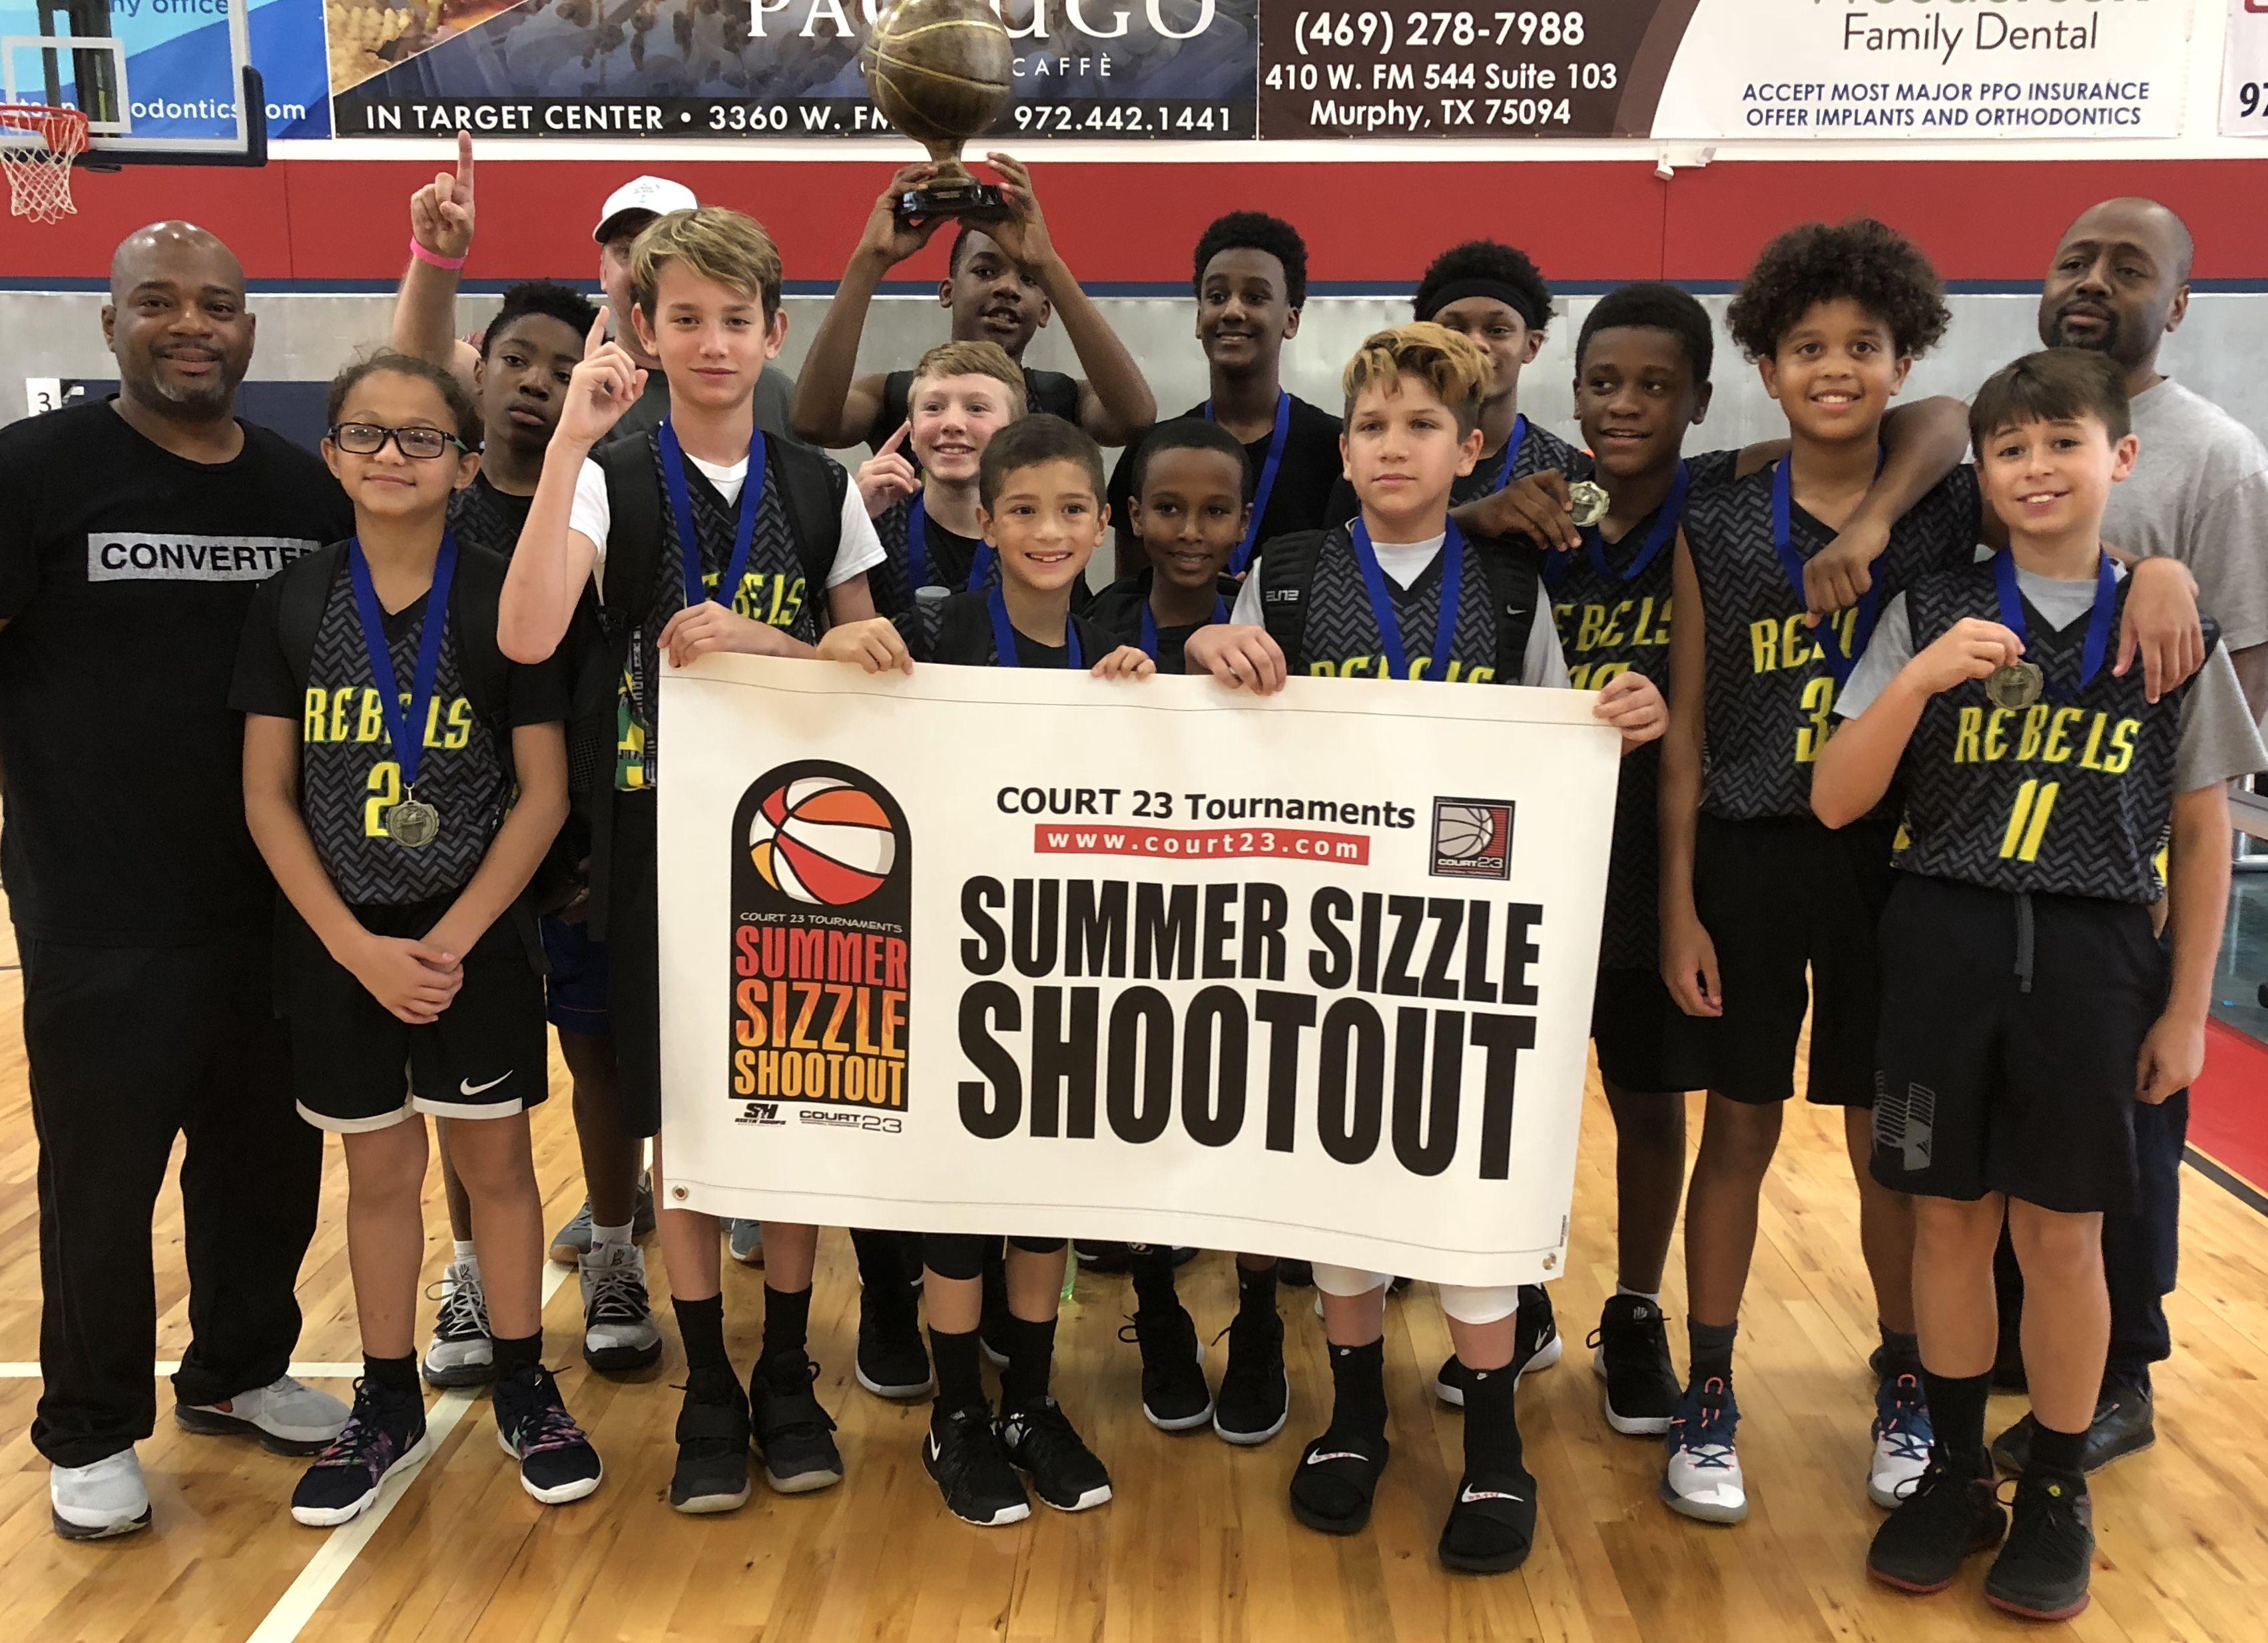 Court 23 Tournaments Elite Youth Basketball Tournaments Summer Sizzle Shootout Youth Basketball Tournaments Basketball Tournament